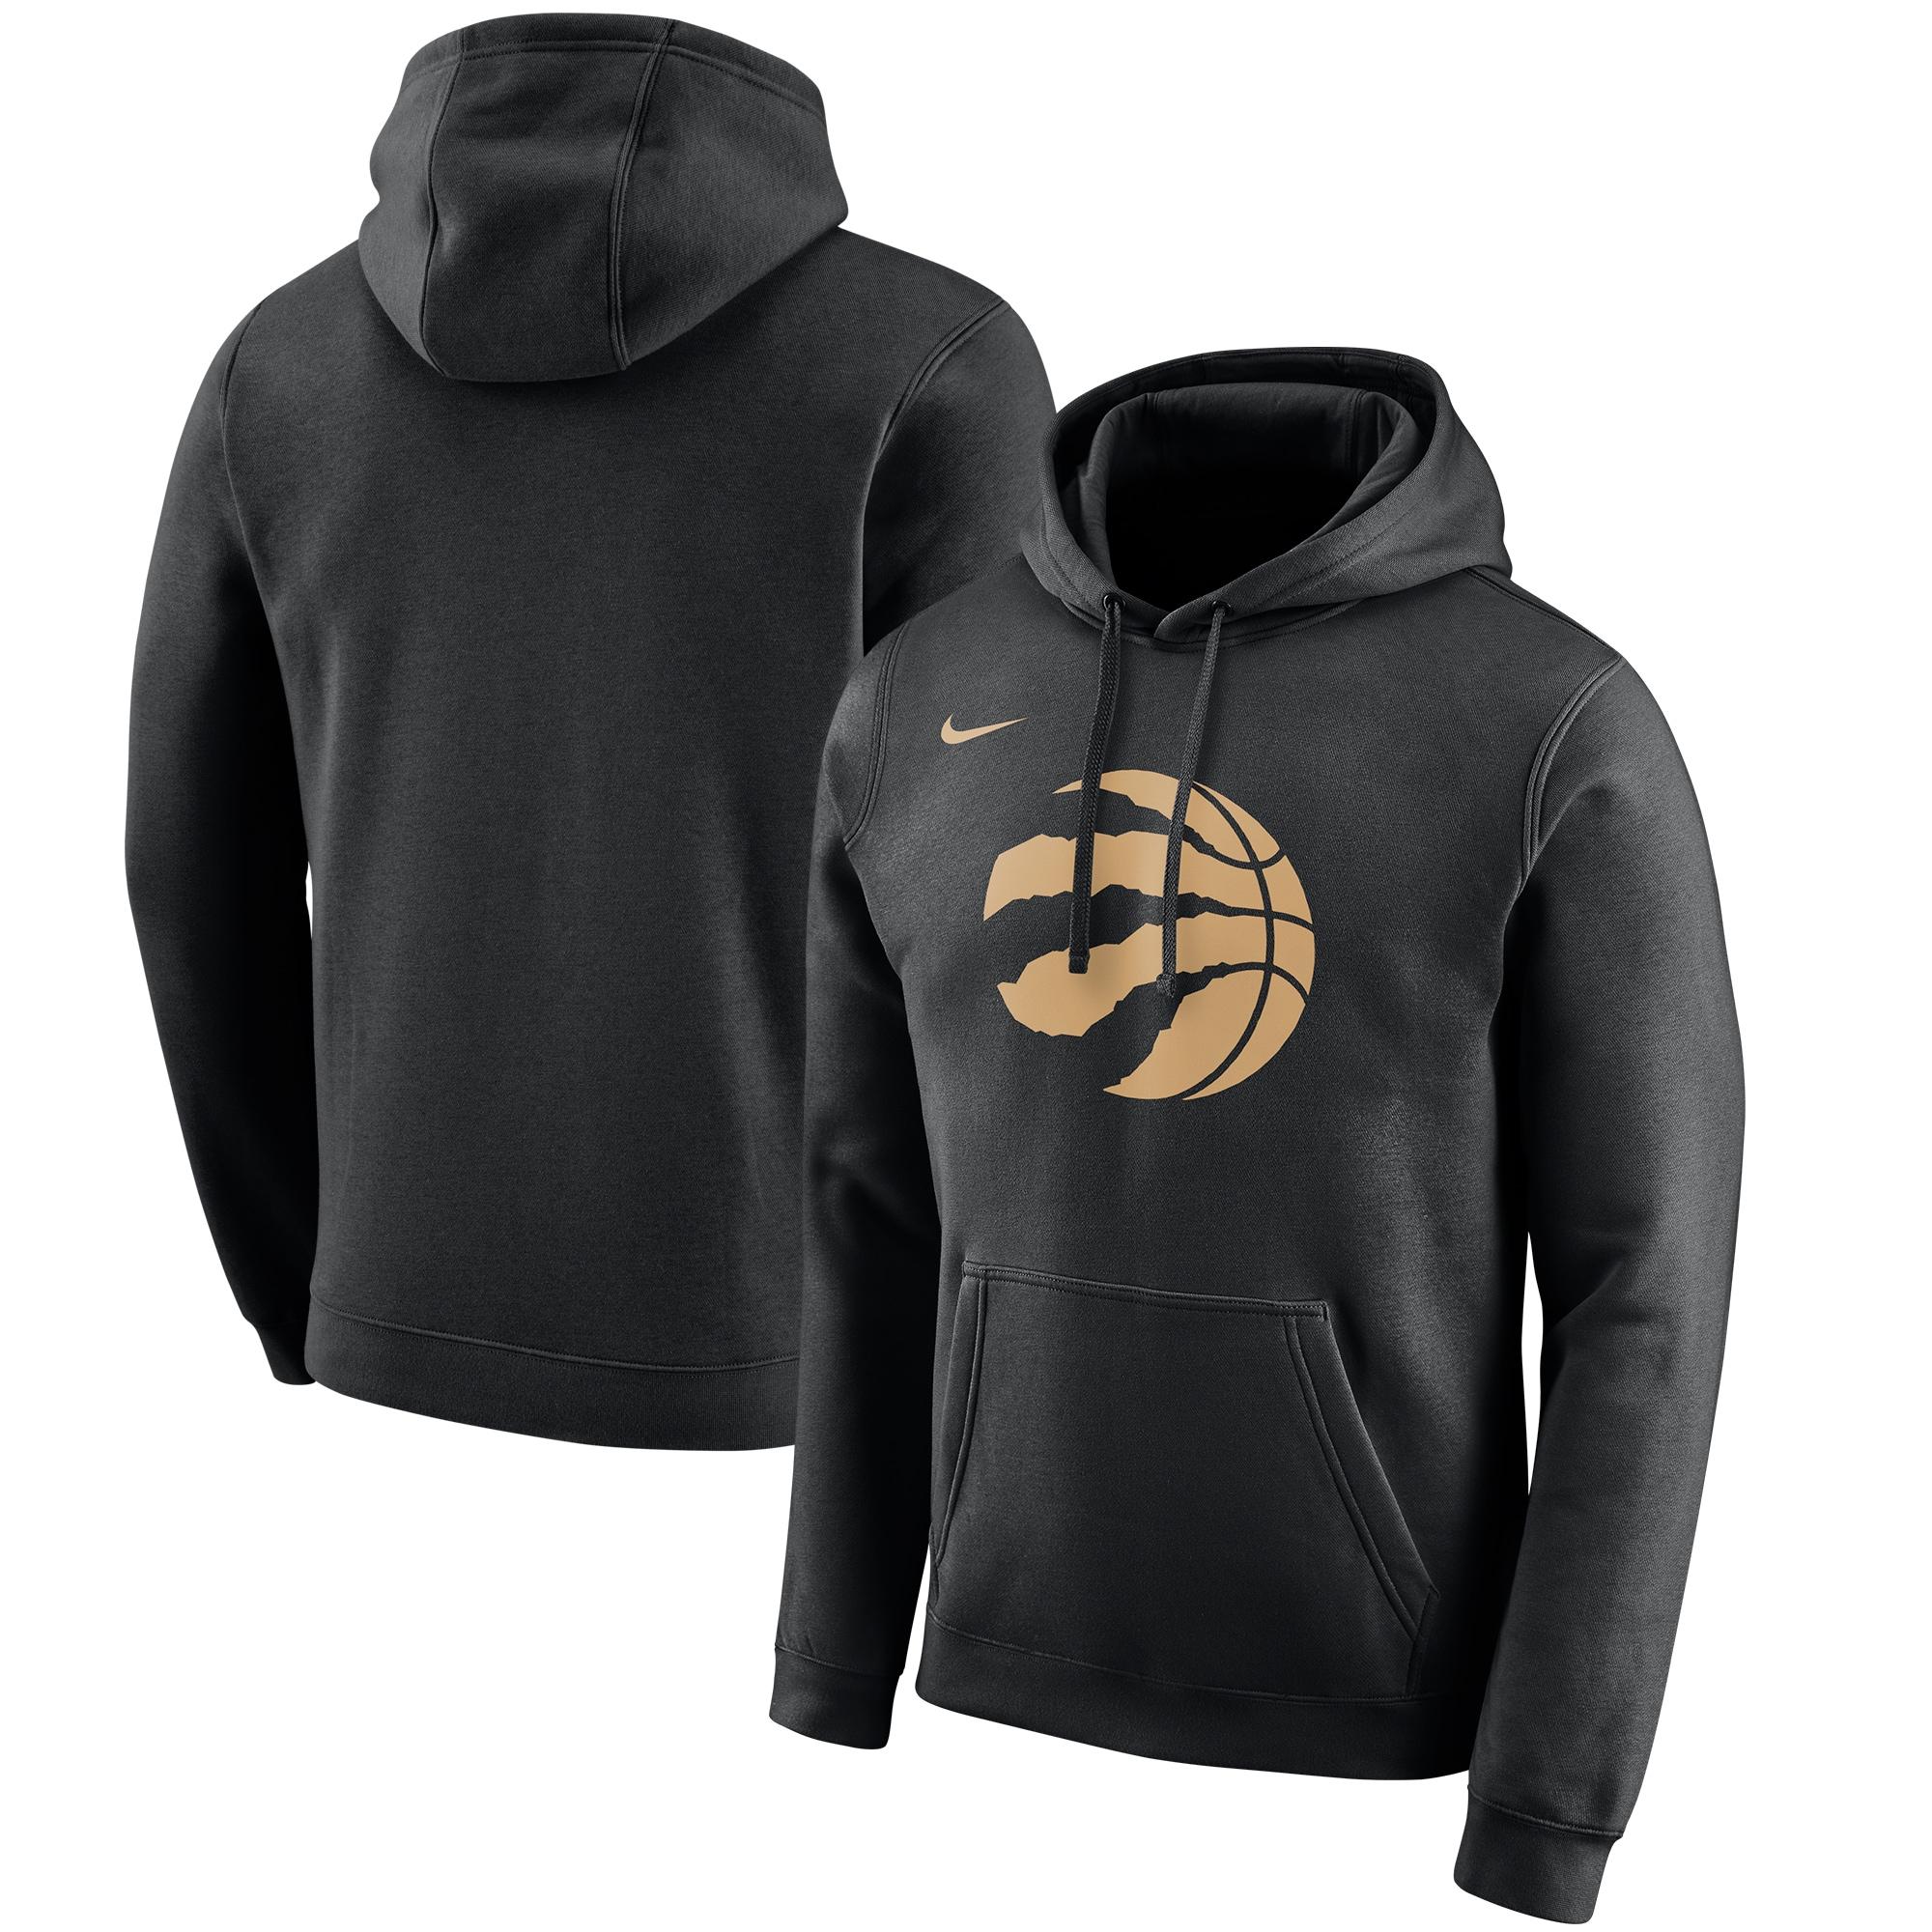 Toronto Raptors Nike 2019/20 City Edition Club Pullover Hoodie - Black